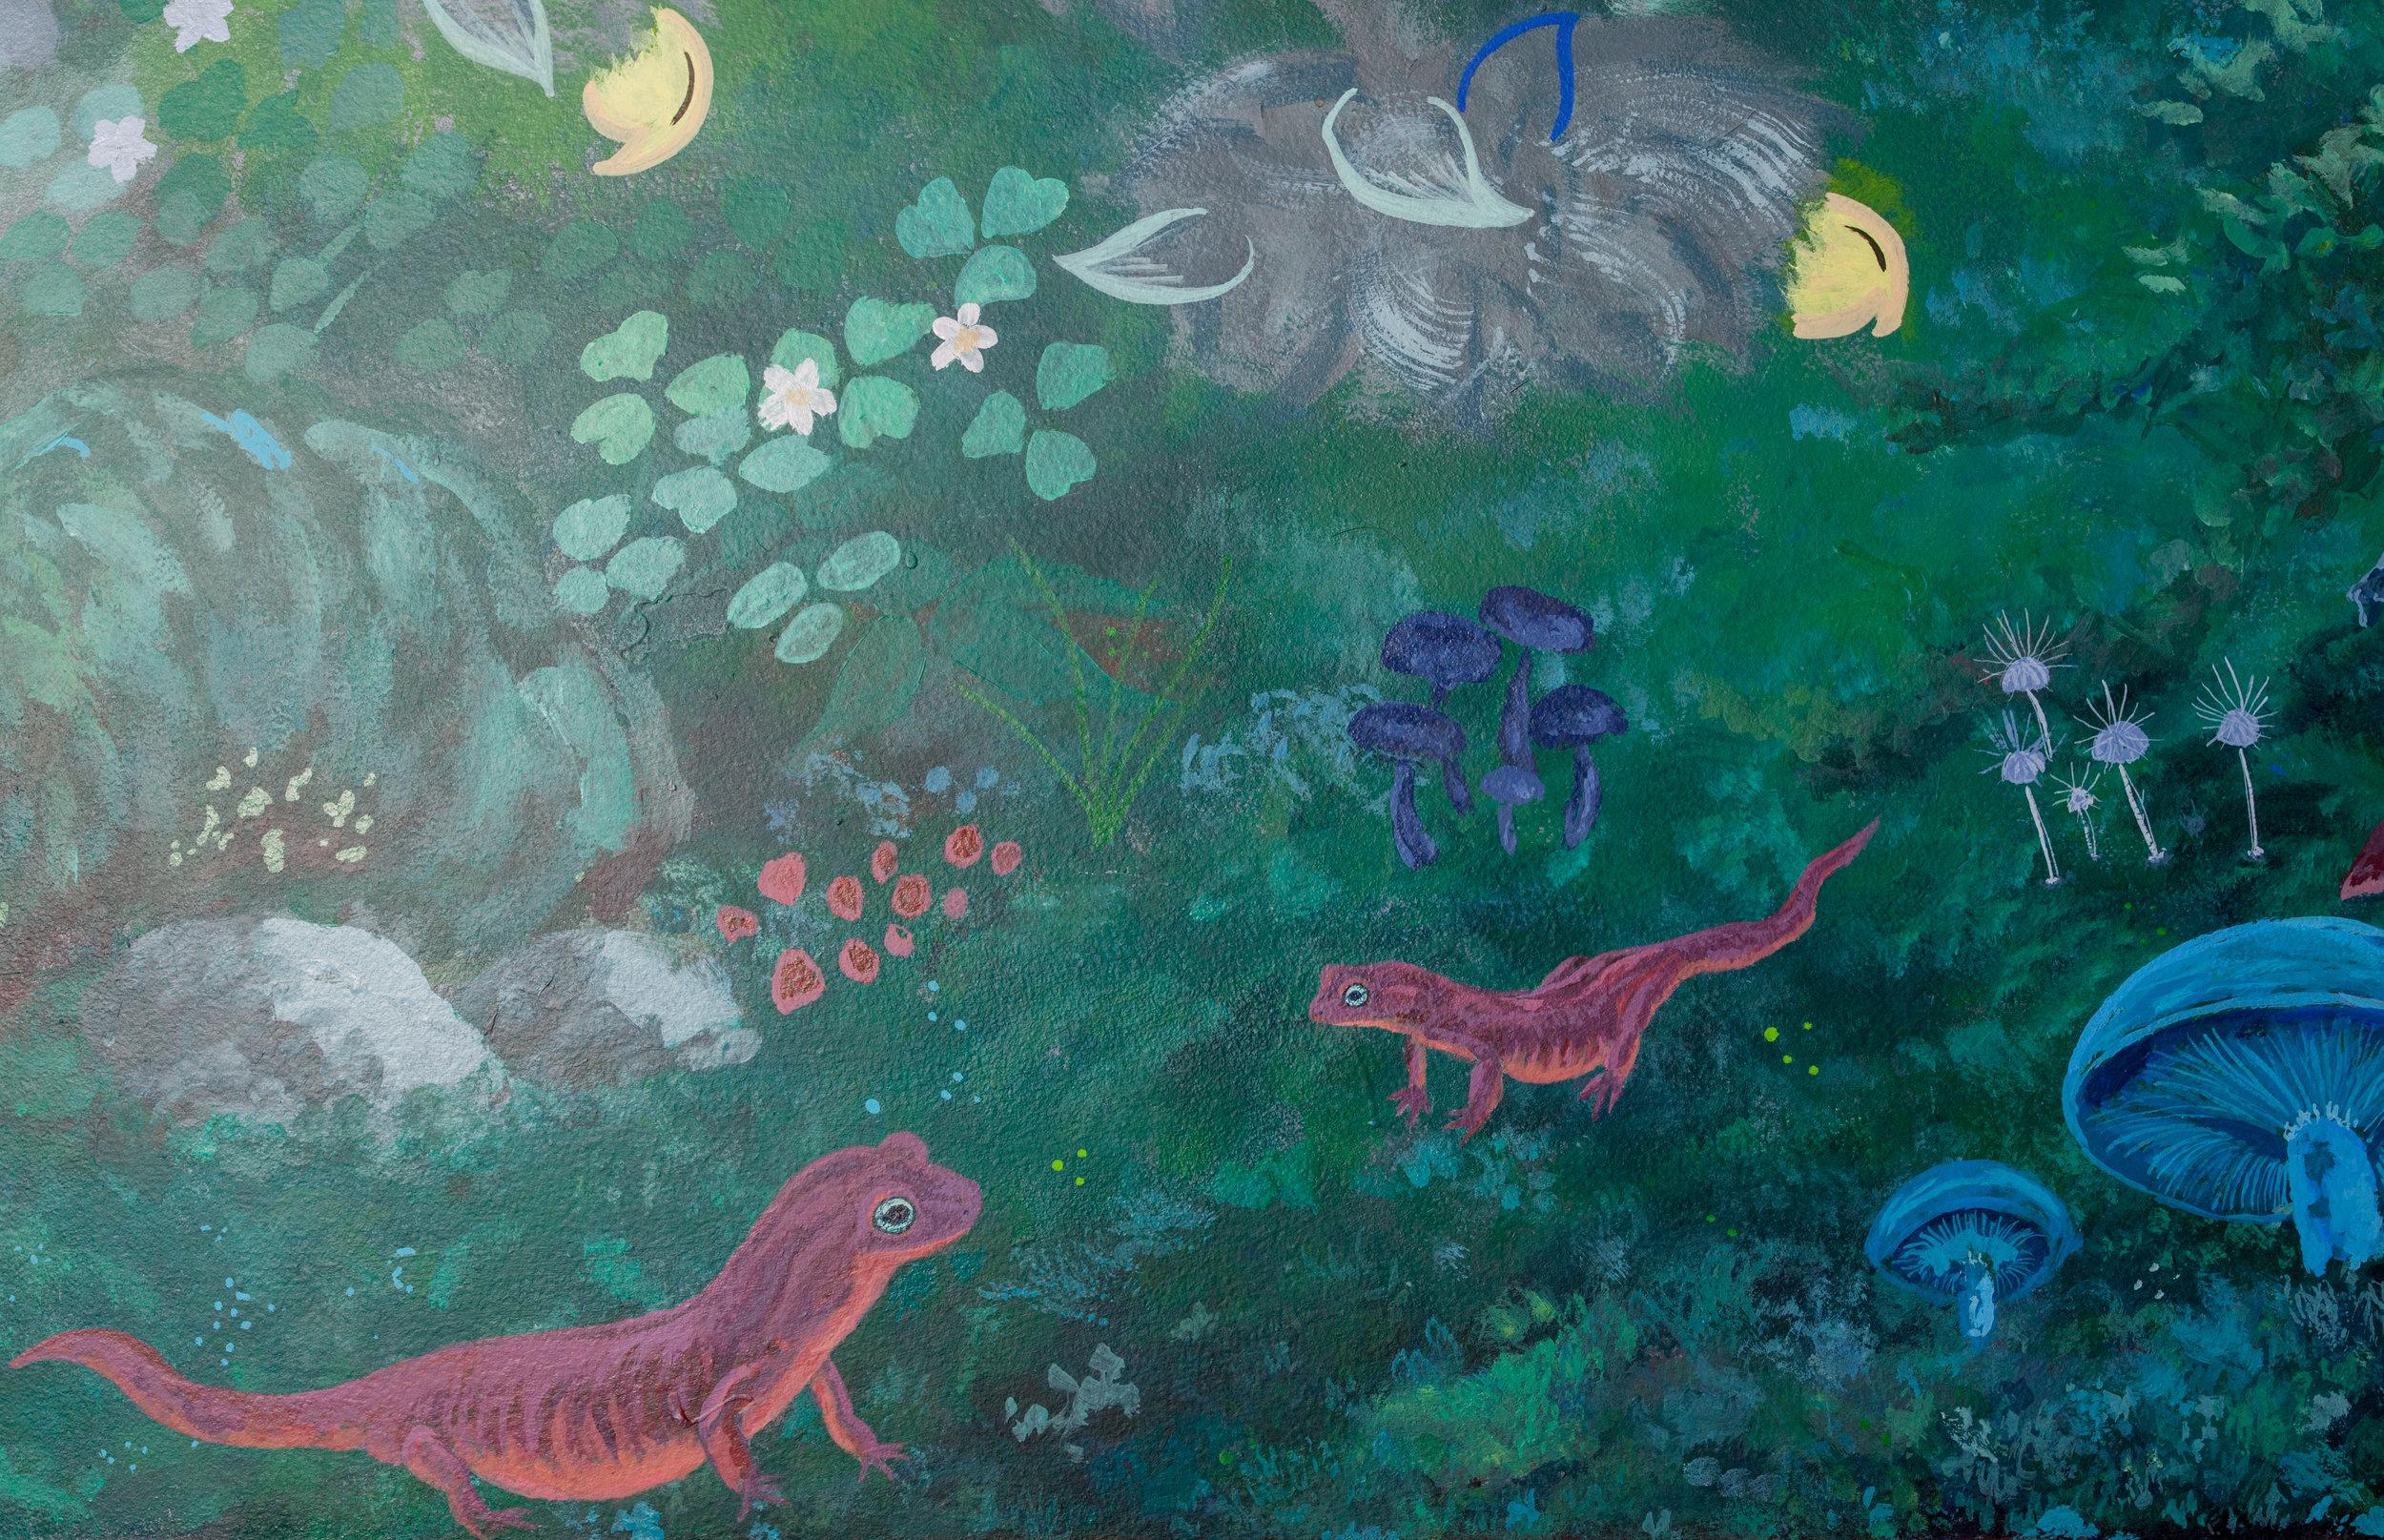 Alex Lebron Mural Philz-15.jpg